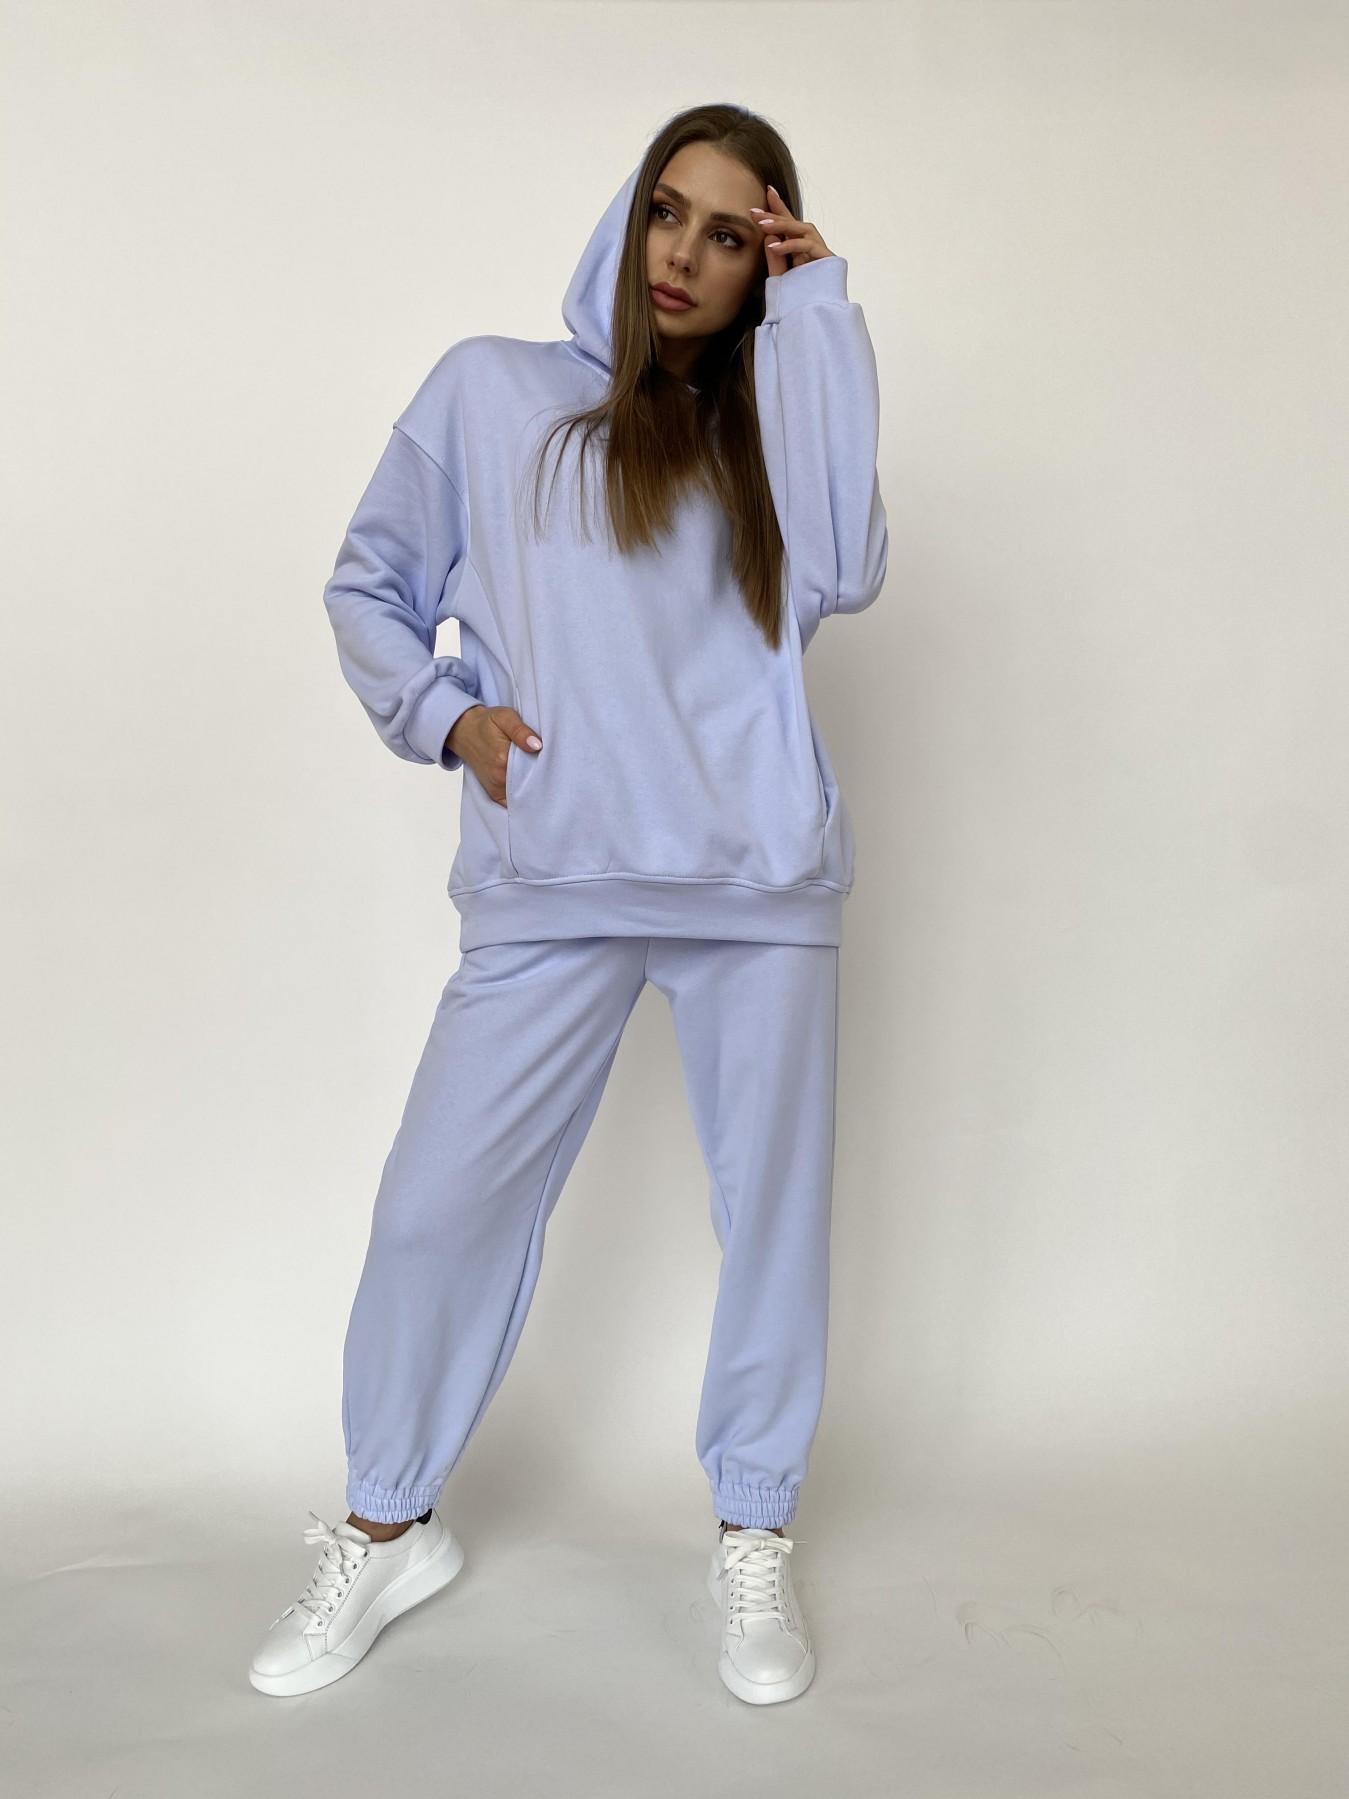 Марион костюм из 3х нитки 10581 АРТ. 47635 Цвет: Голубой Светлый - фото 10, интернет магазин tm-modus.ru